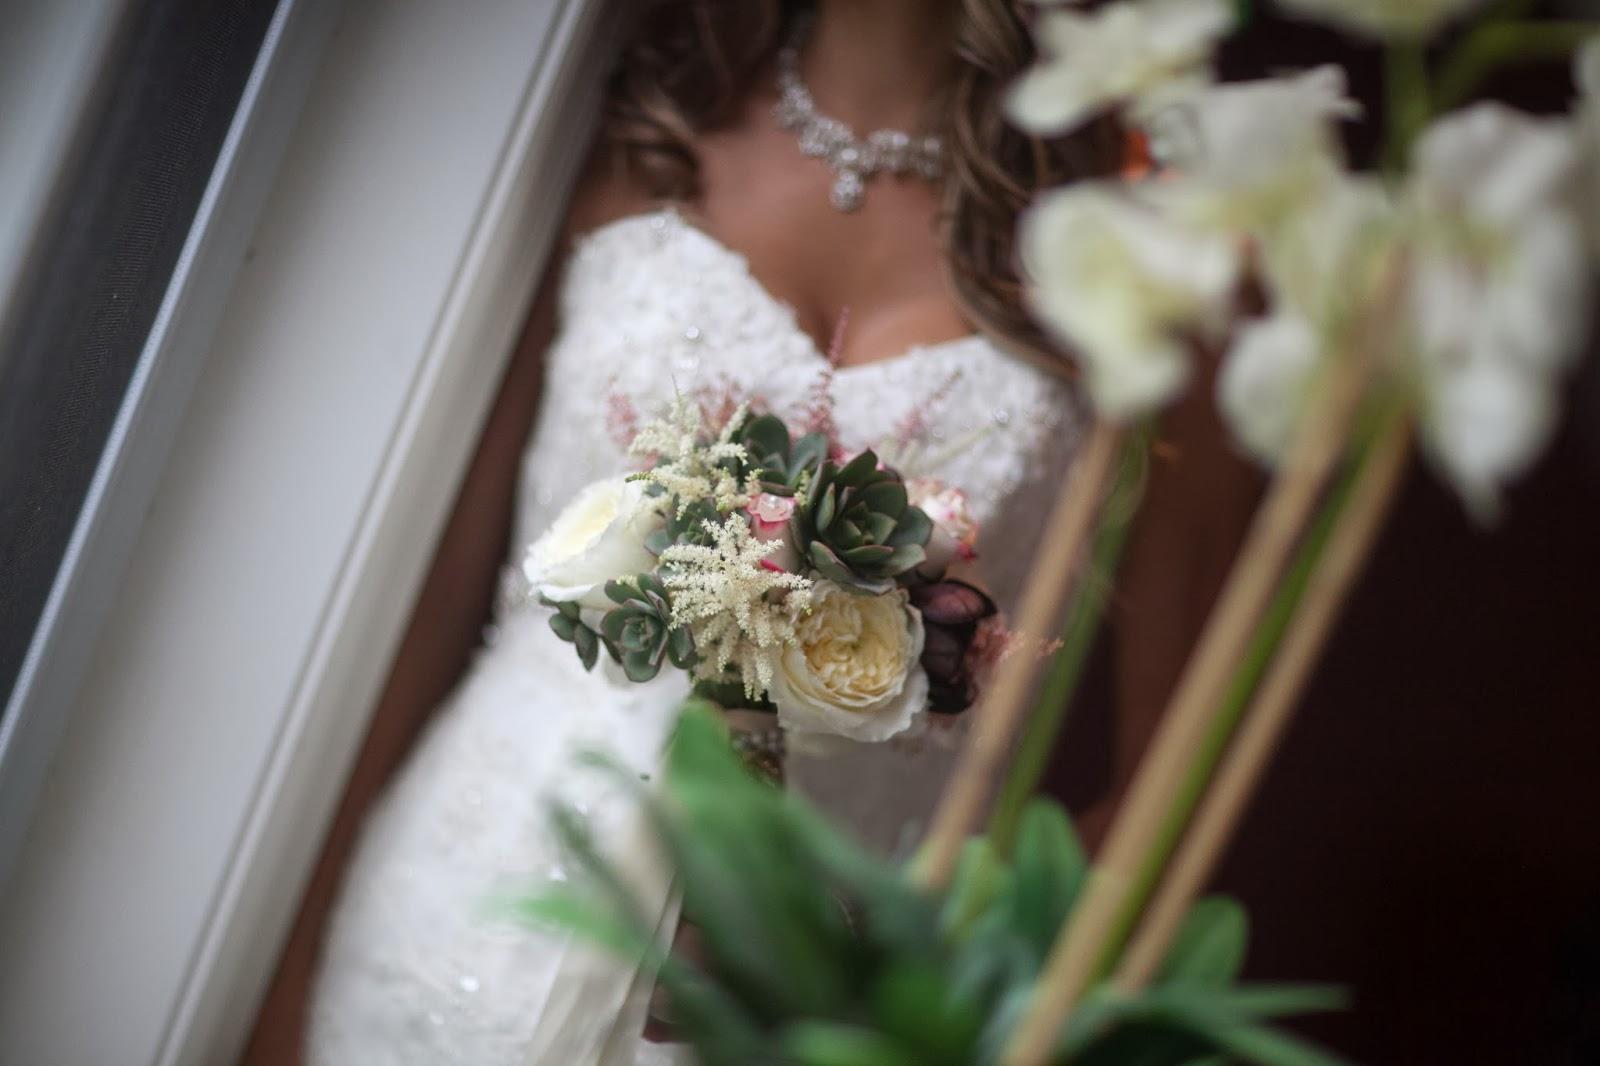 niagara wedding planner a divine affair jennie dobrucki jenn szambor